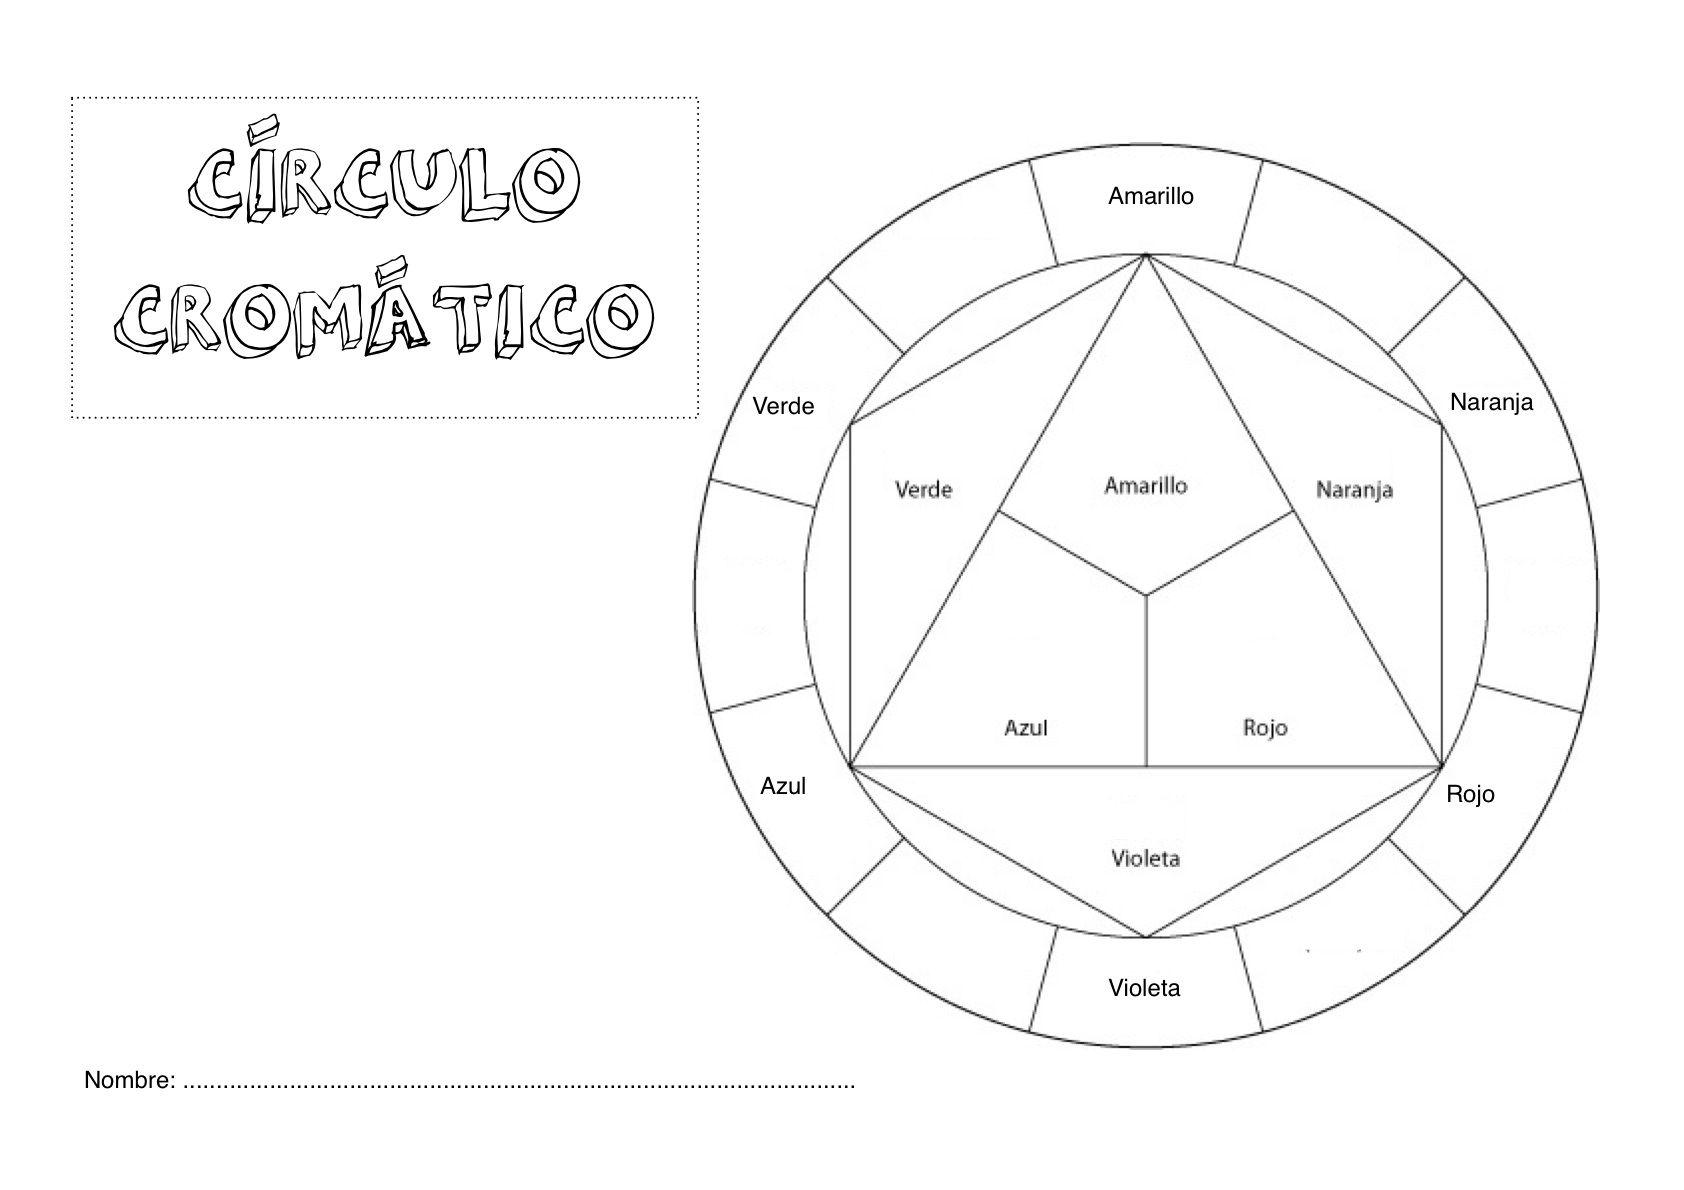 CIRCULO CROMATICO PARA COLOREAR | circuló cromatico | Pinterest ...